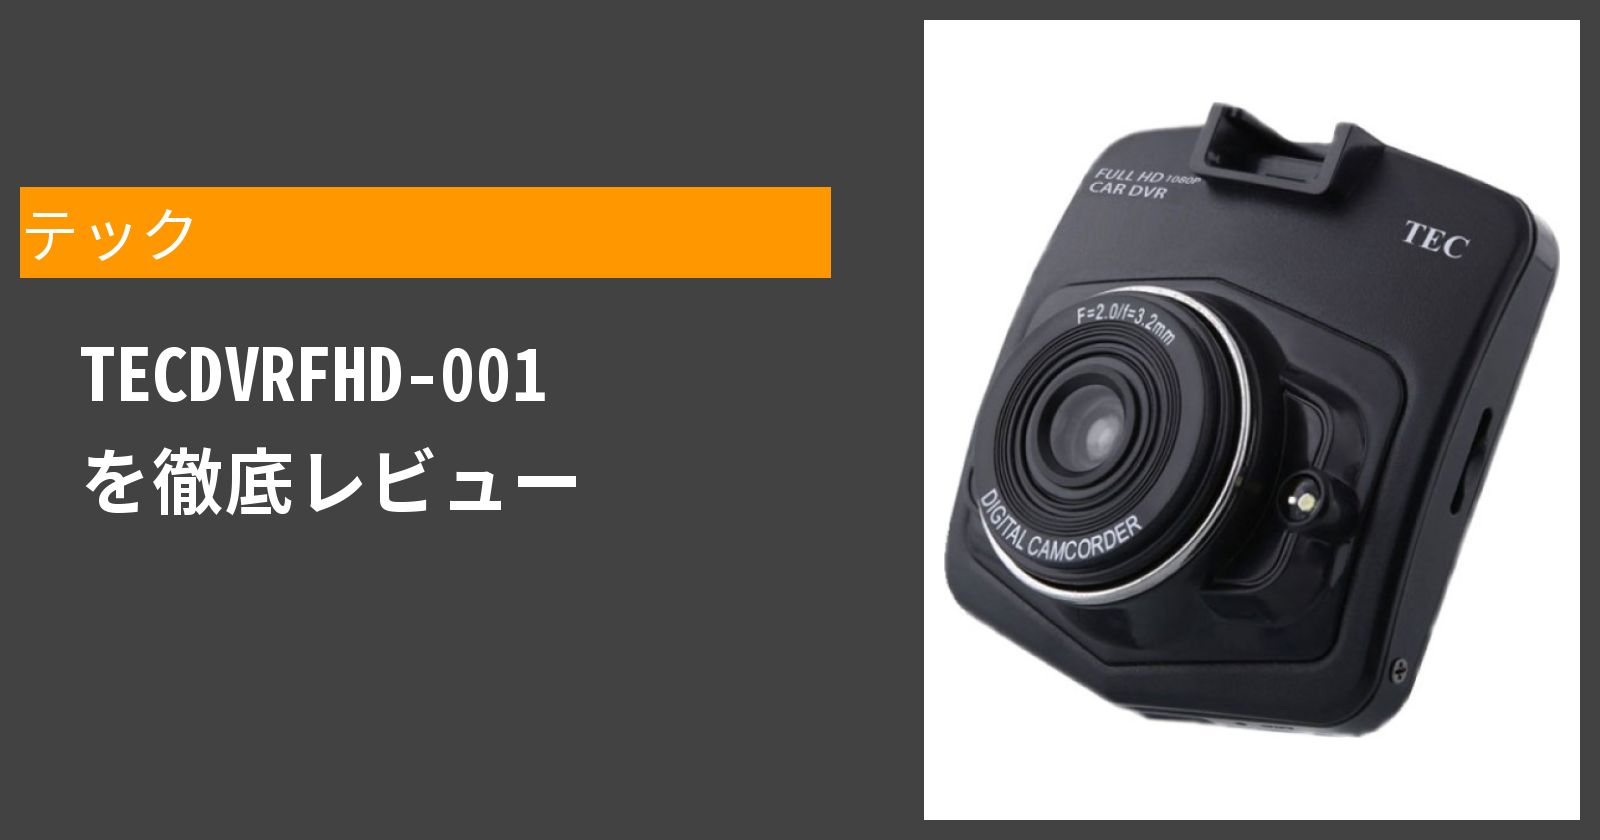 TECDVRFHD-001を徹底評価